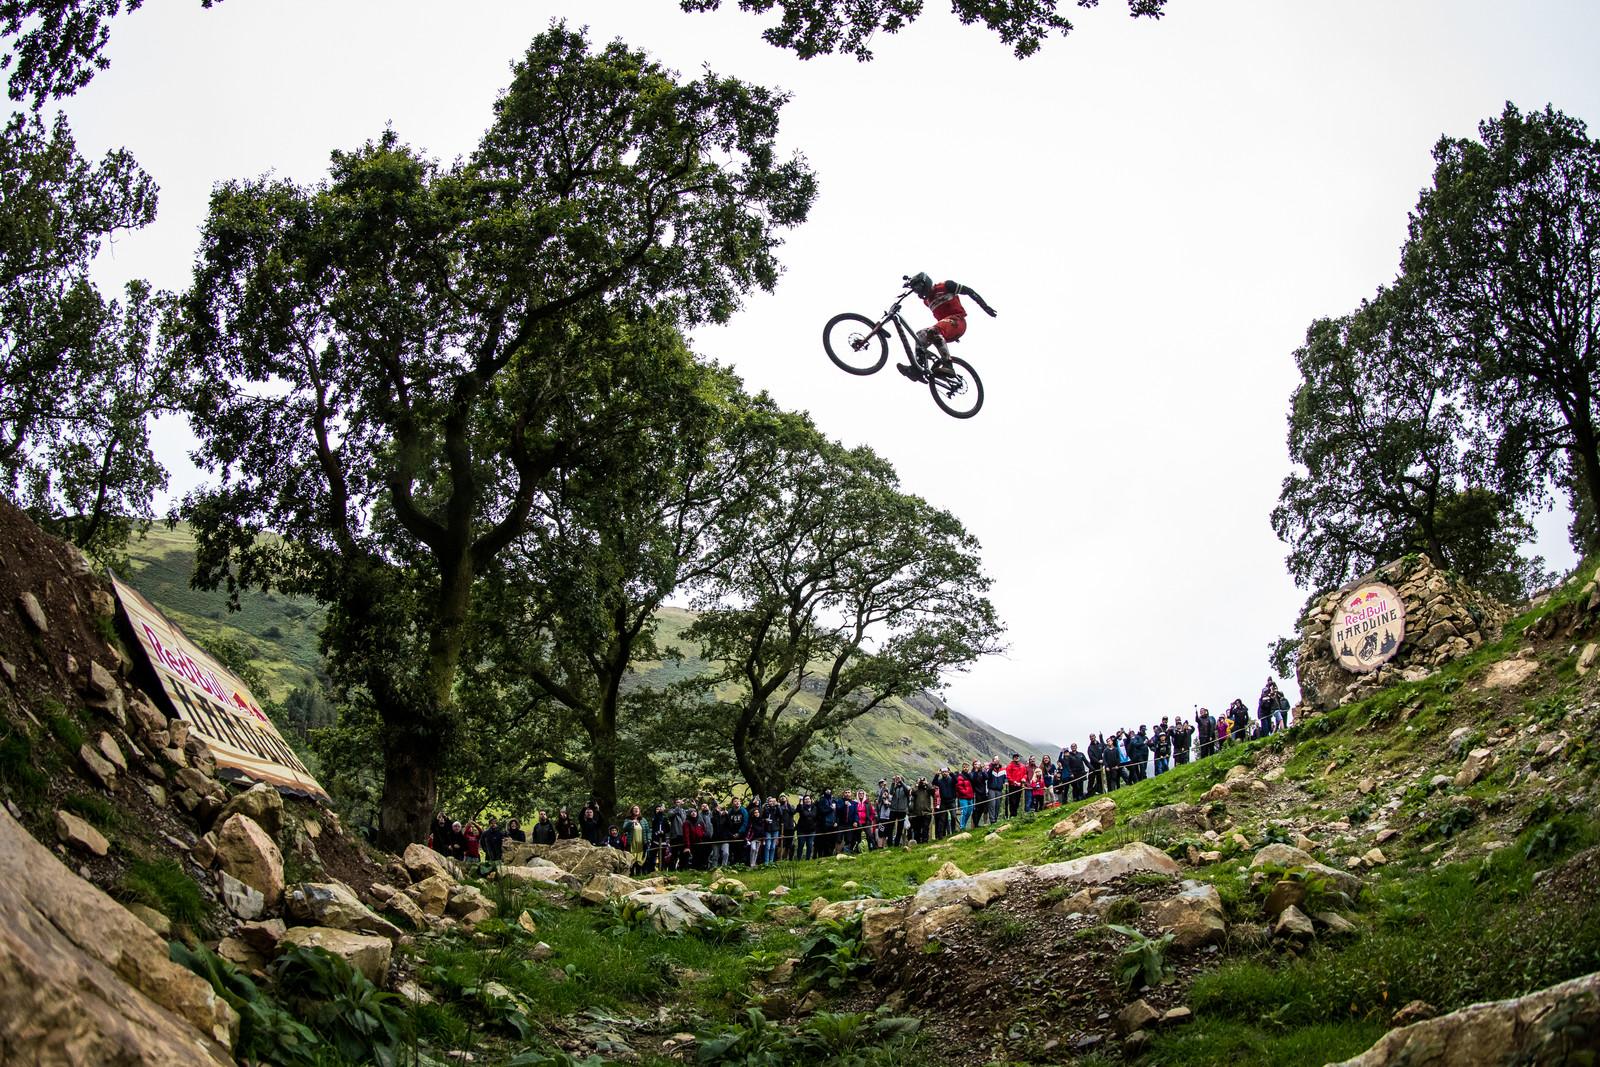 Kade Edwards - Red Bull Hardline in Photos - Mountain Biking Pictures - Vital MTB